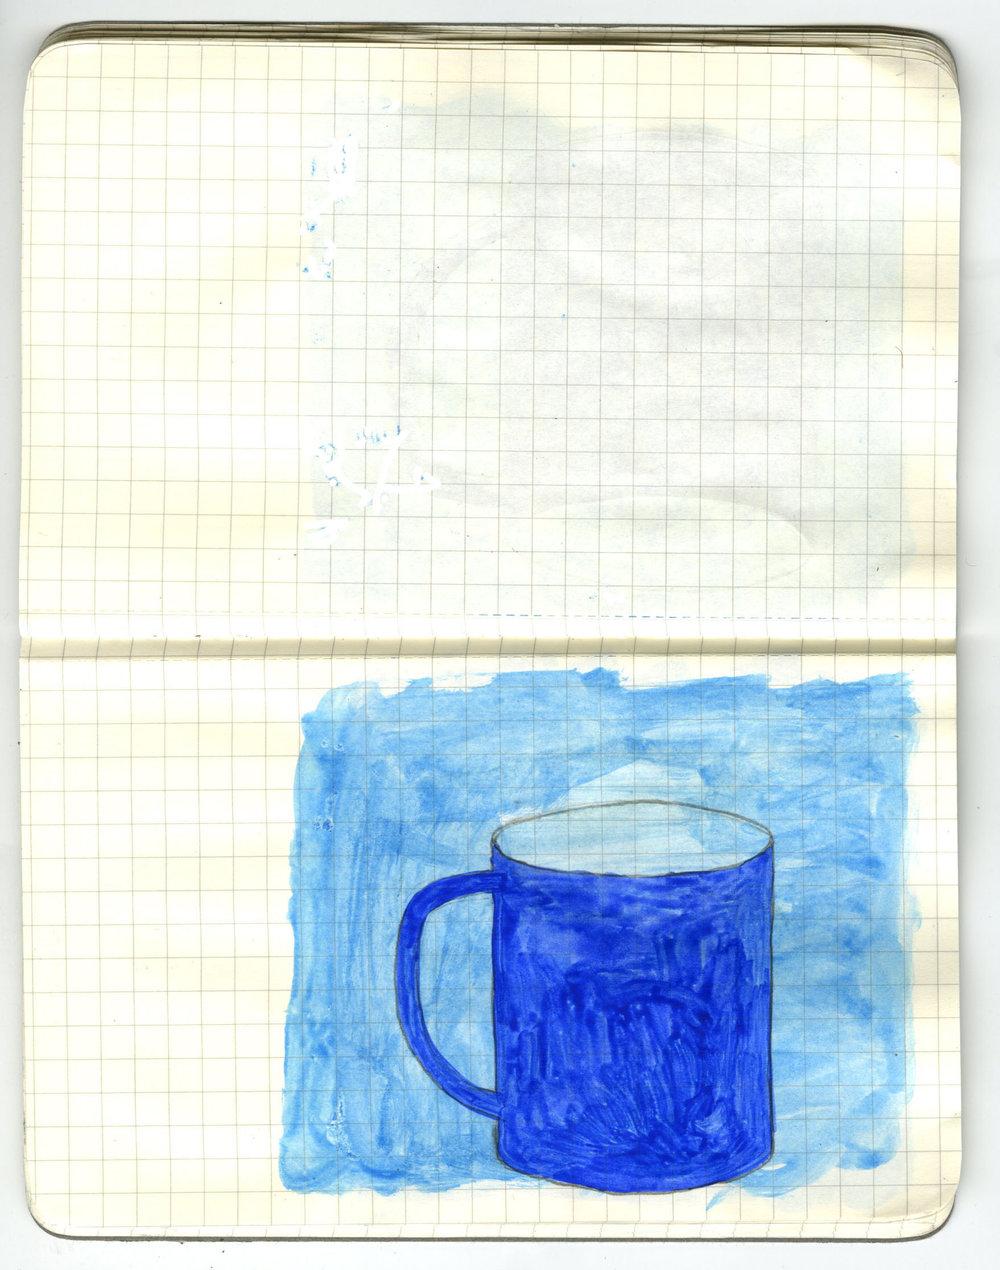 cup016.jpg